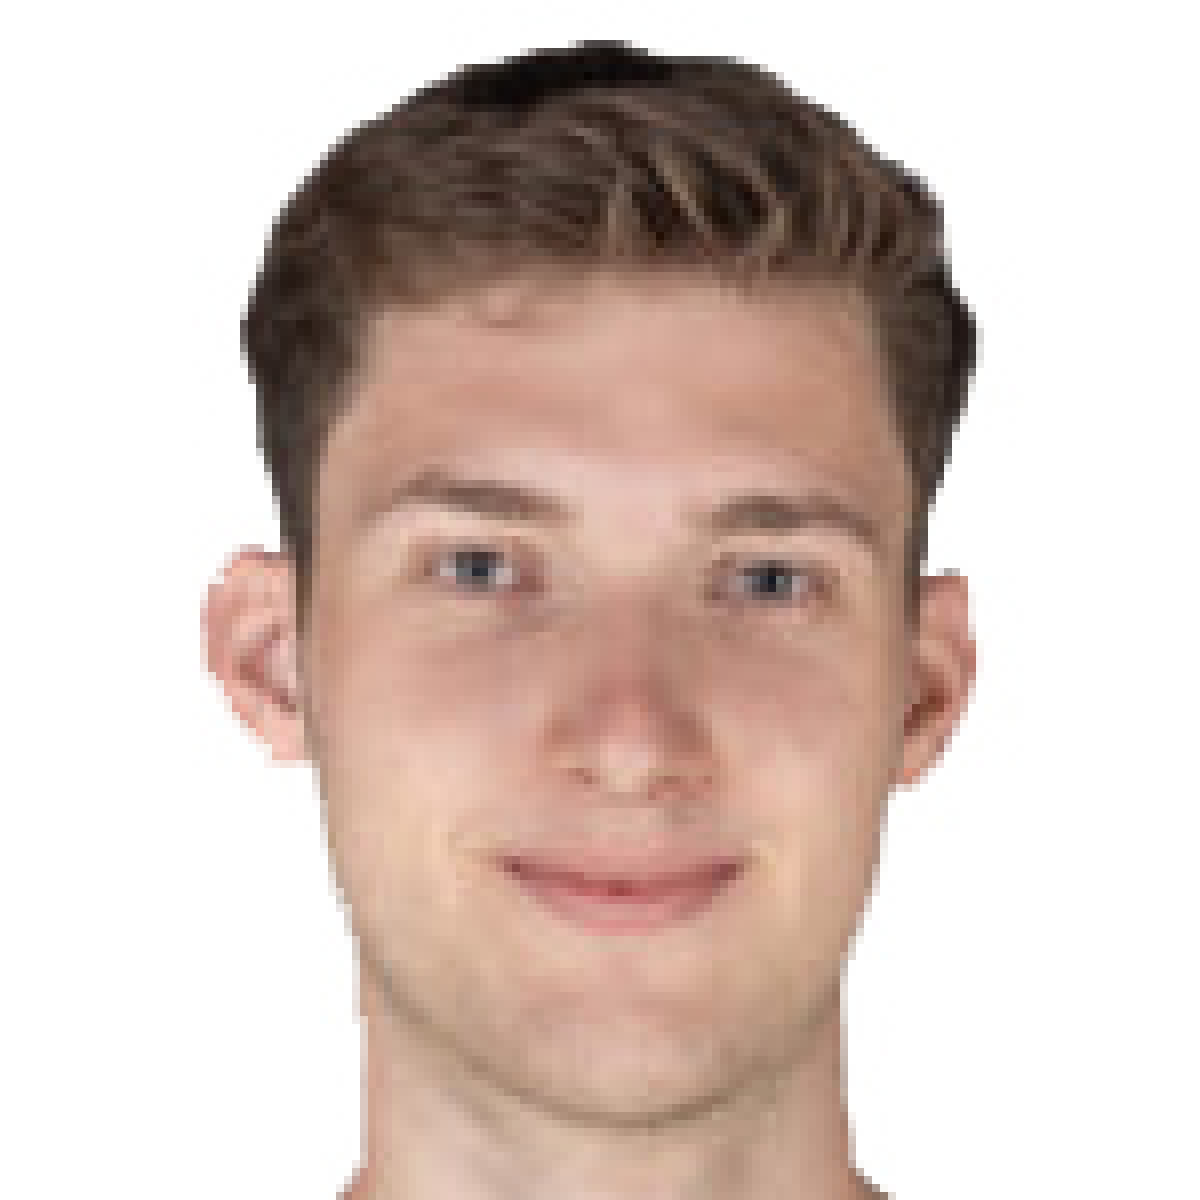 Stefan Ilzhofer